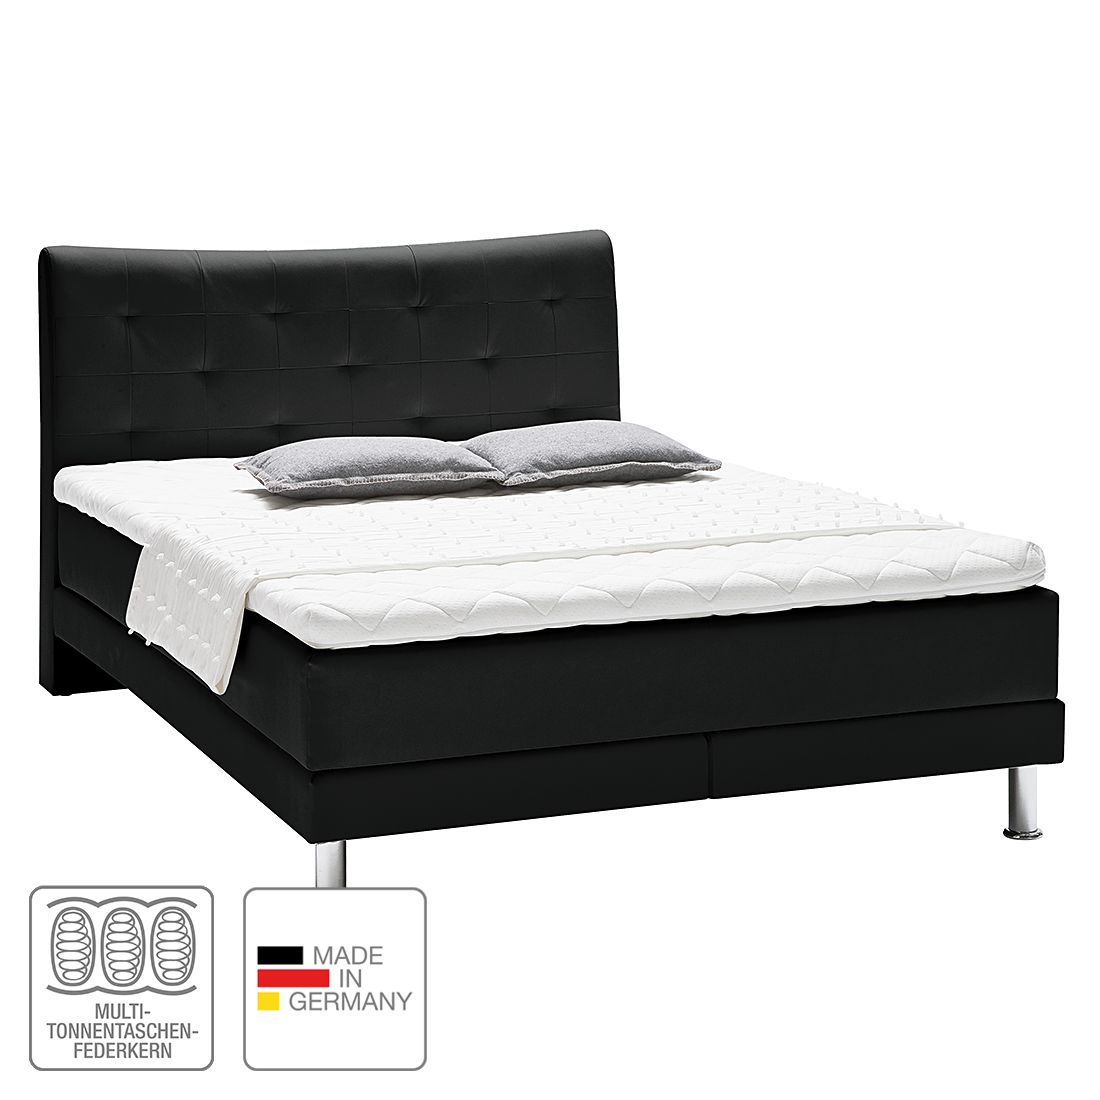 boxspringbett vega kunstleder 140 x 200cm h2 bis 80. Black Bedroom Furniture Sets. Home Design Ideas